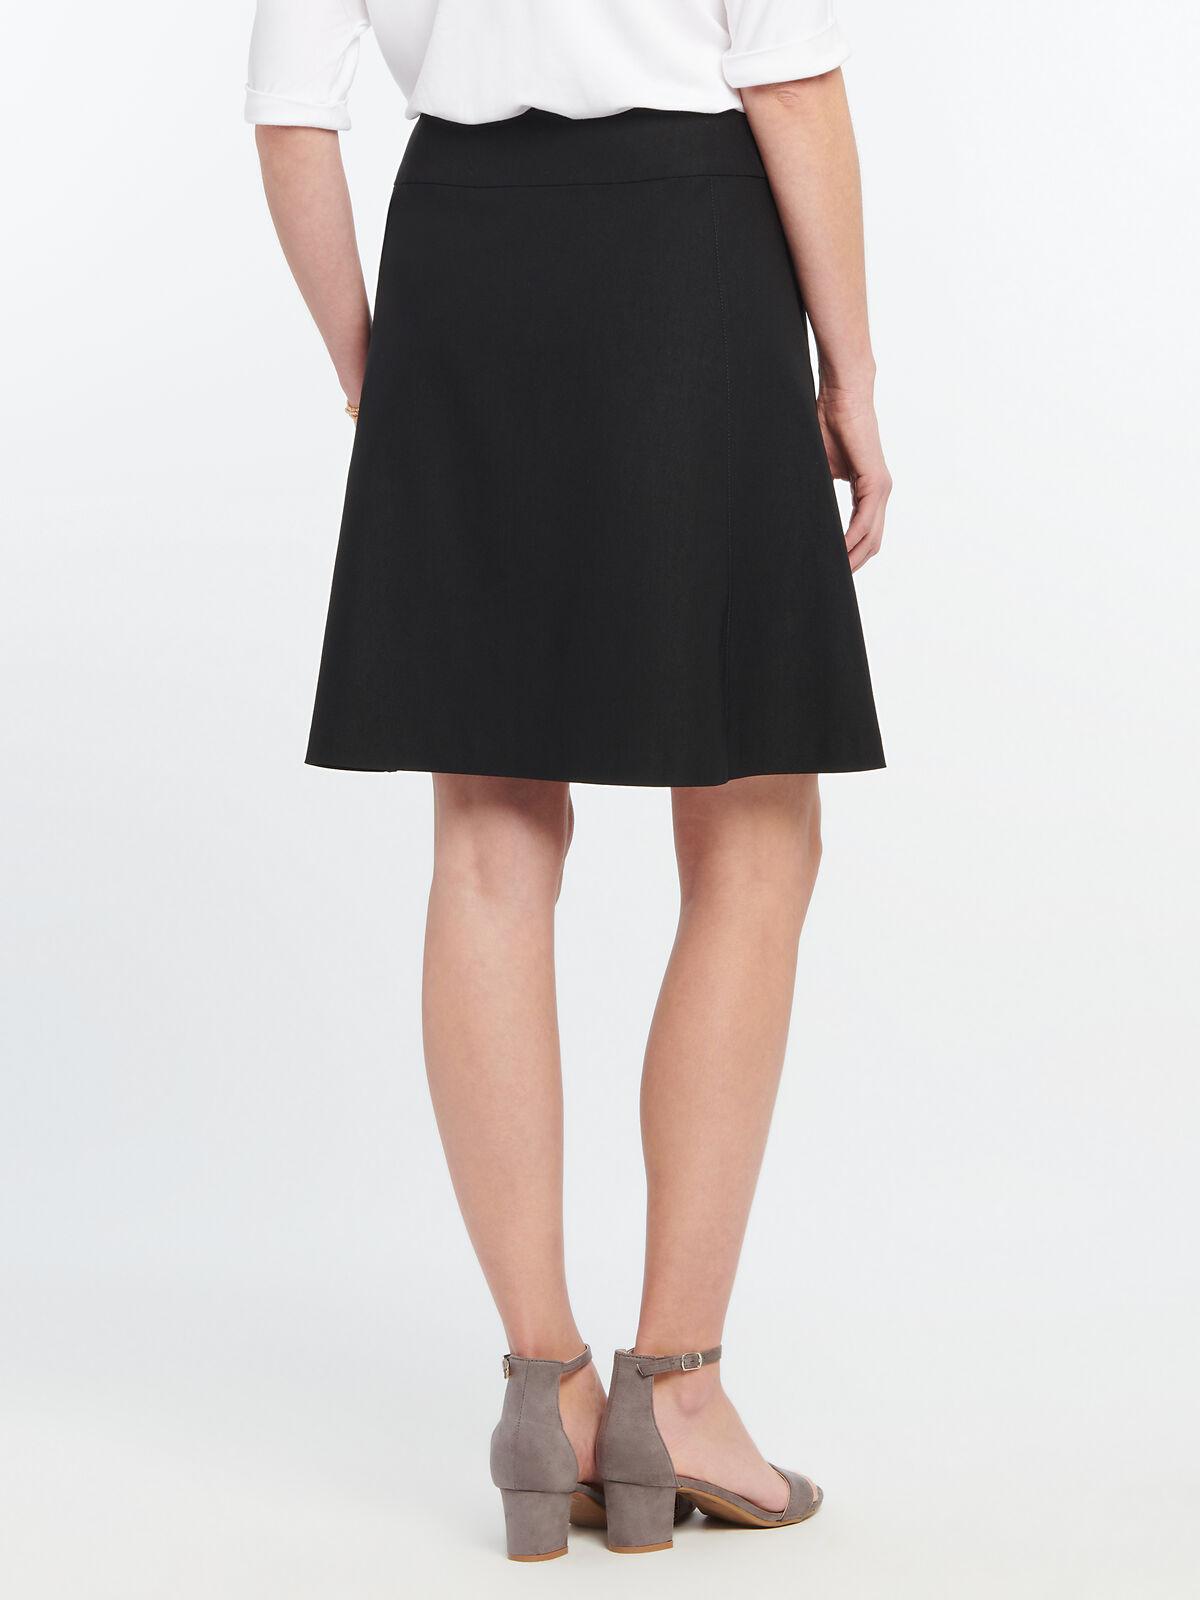 Wonderstretch A-Line Skirt